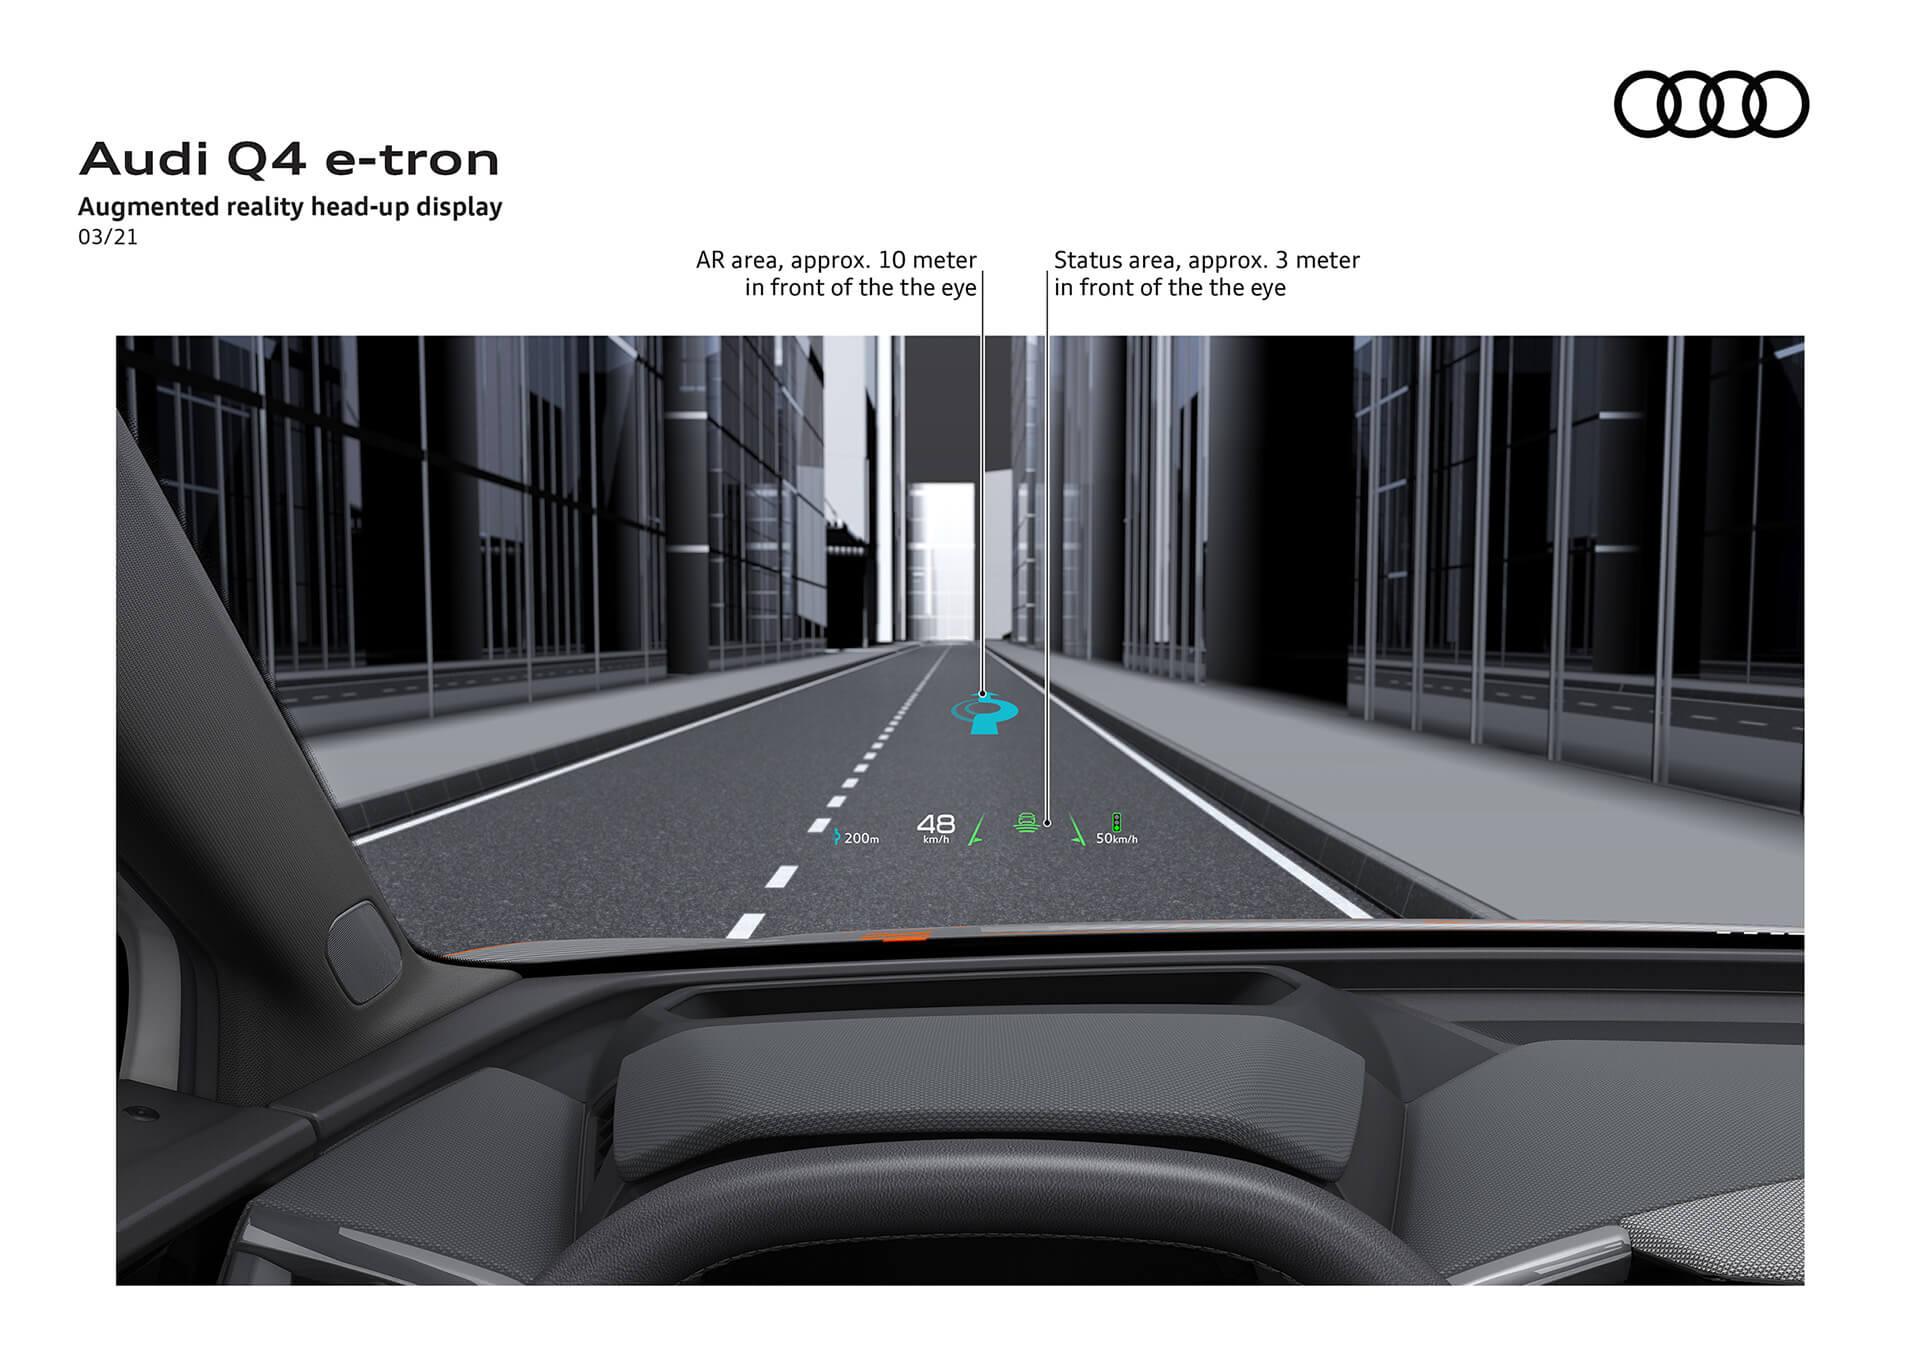 NEO AUDI Q4 E-TRON - Augmented reality head-up display